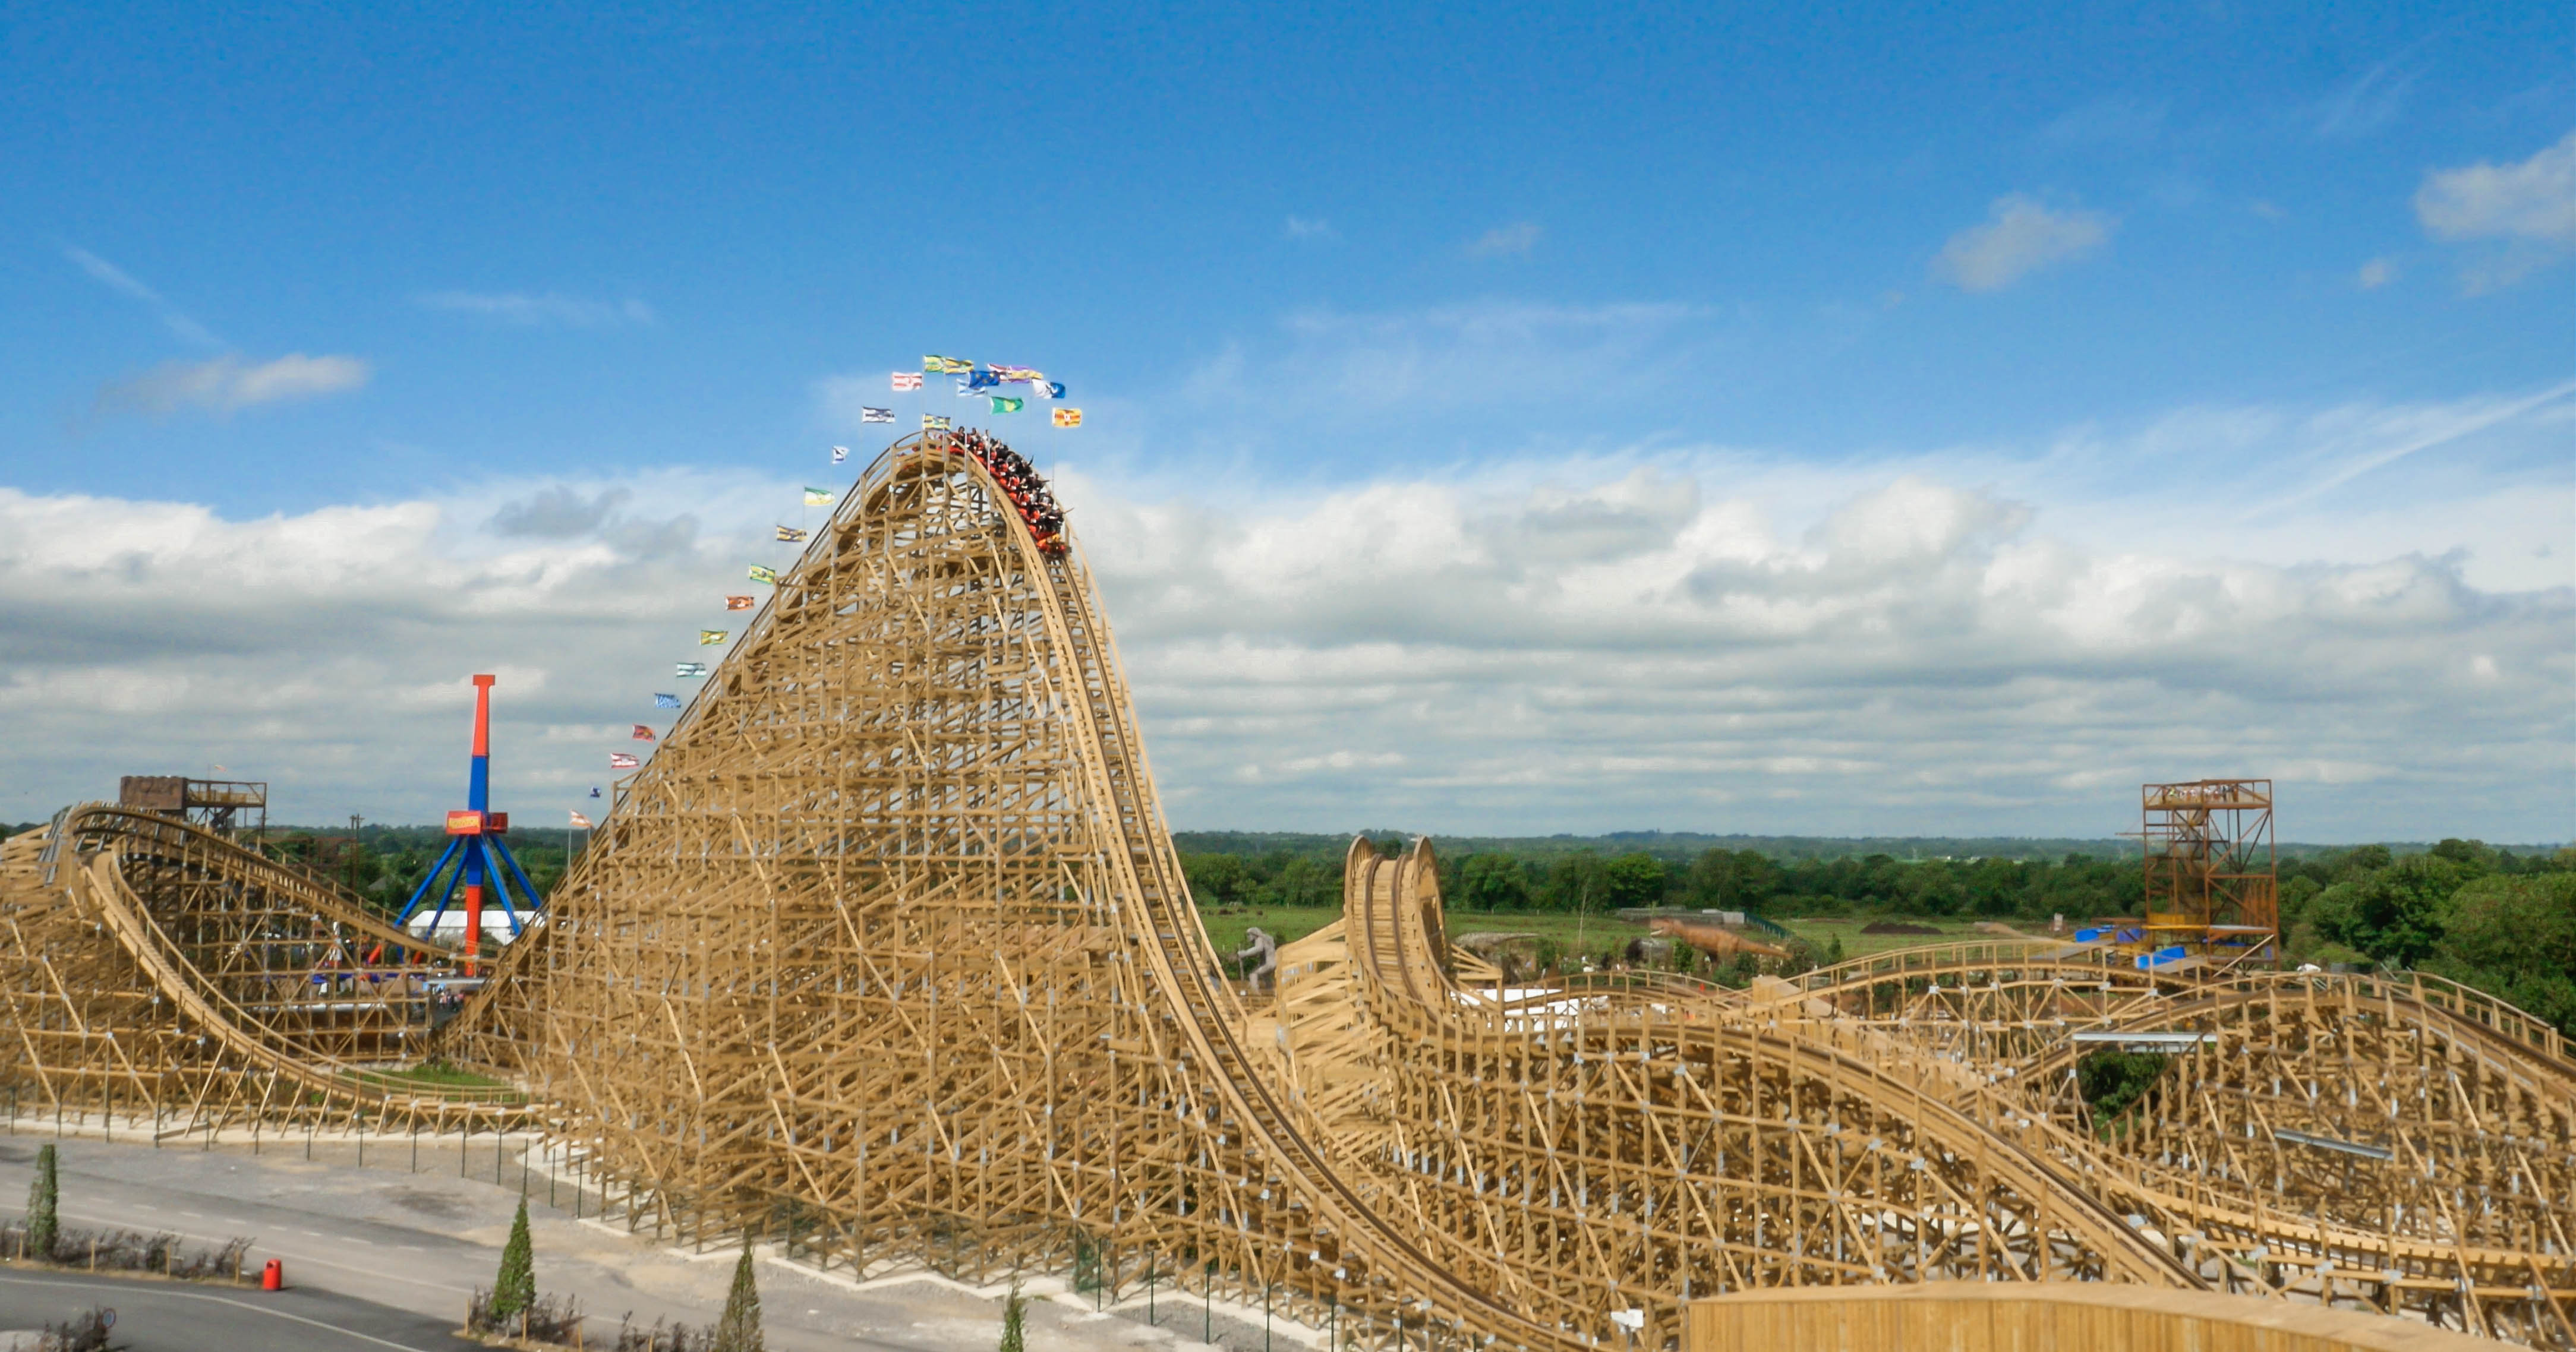 Tayto Park Rollercoaster